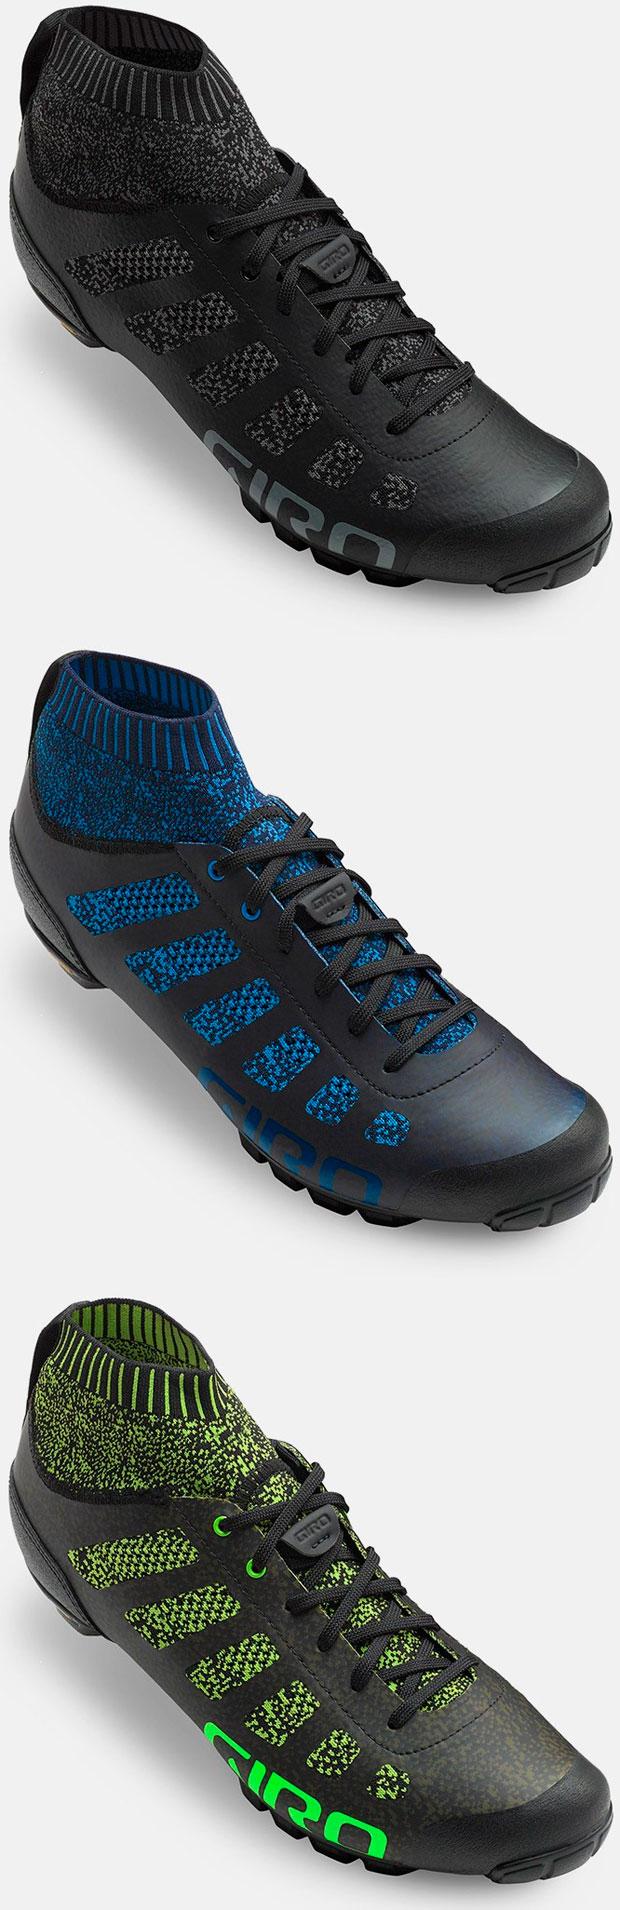 En TodoMountainBike: Giro Empire VR70 Knit, un nuevo concepto de zapatillas para ciclistas de montaña